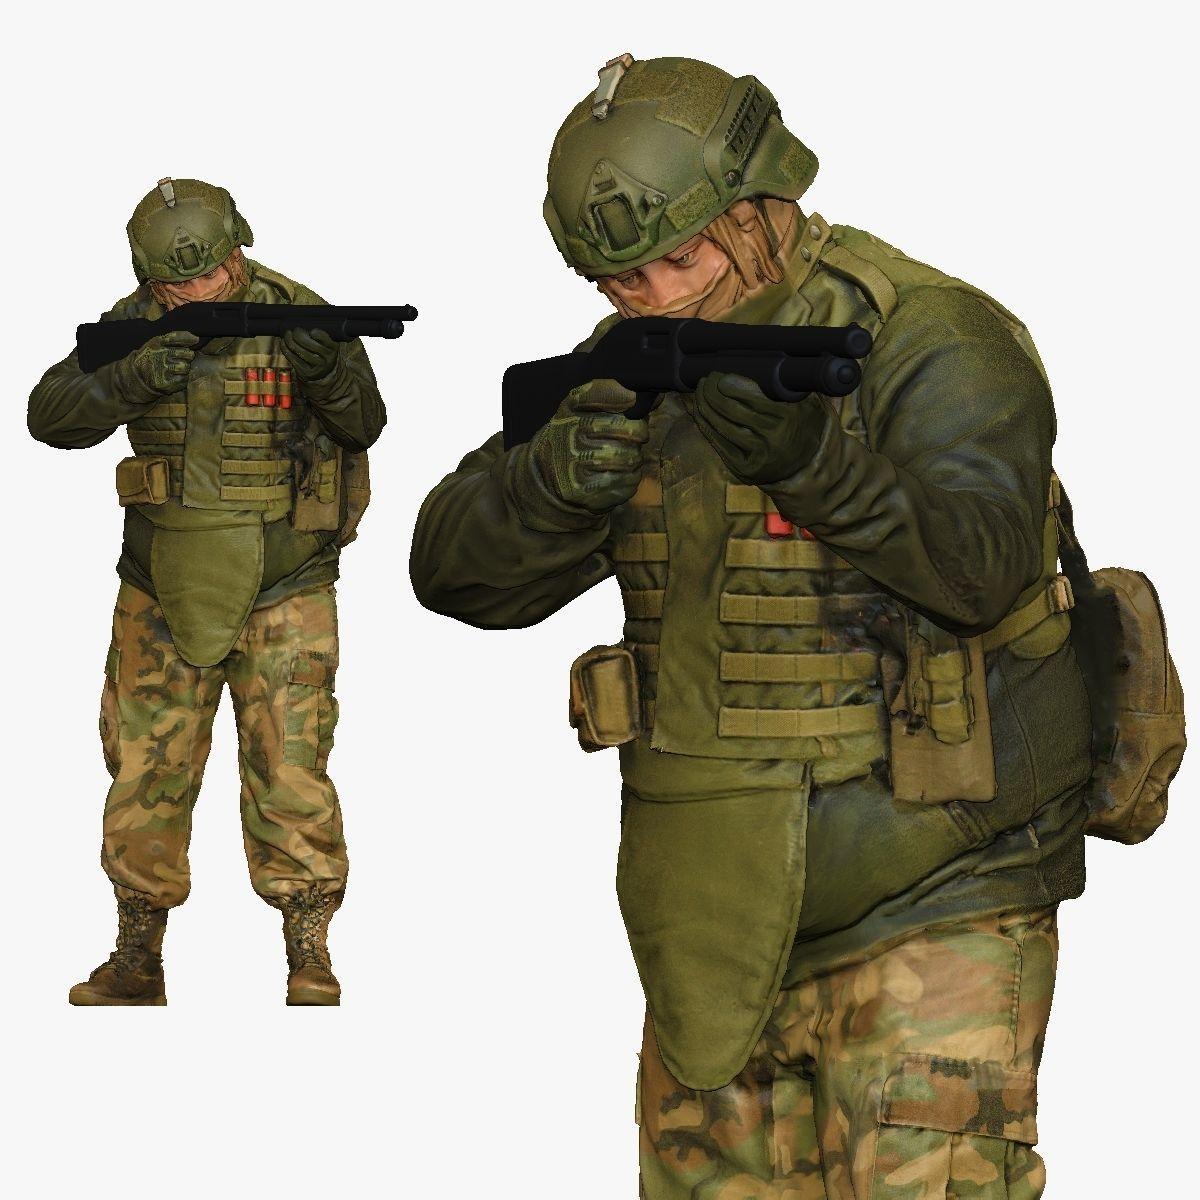 modern soldier aiming with pumpshotgun 001150